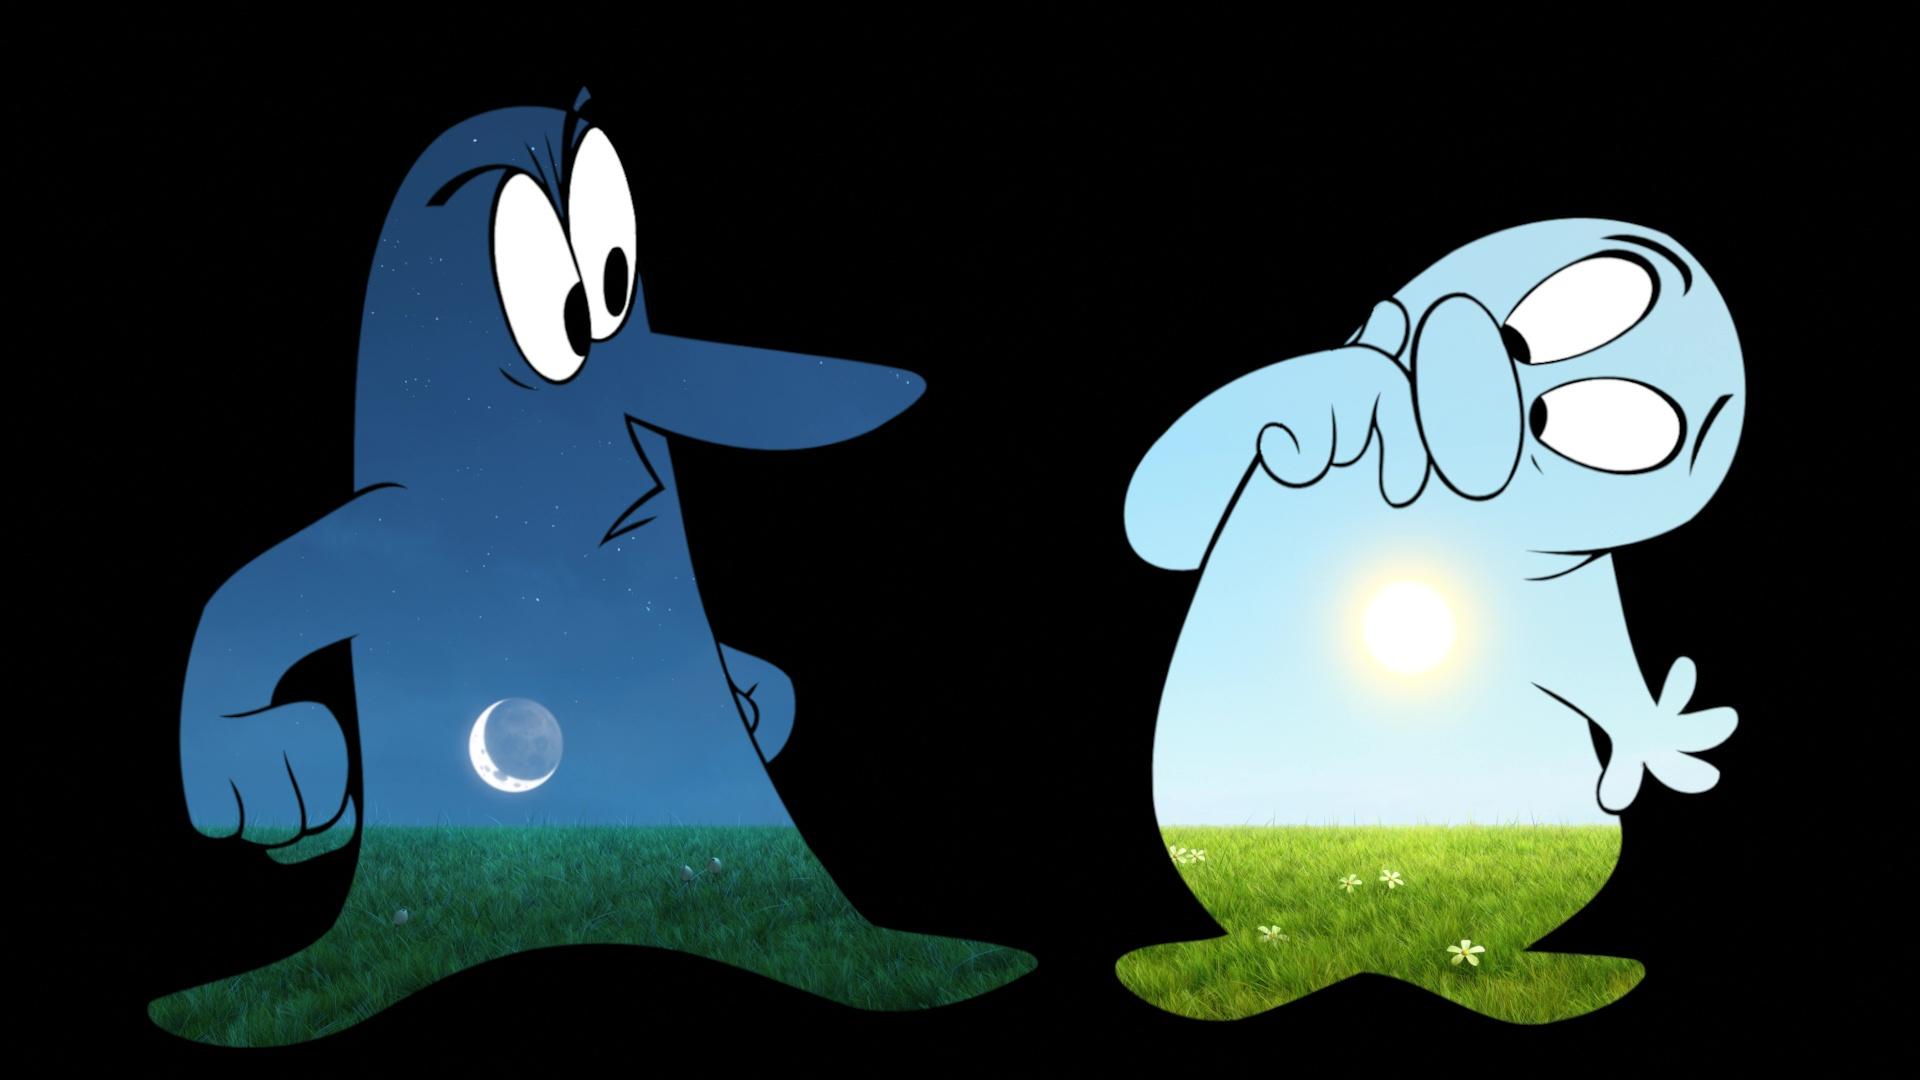 pixar disney jour et nuit day & night